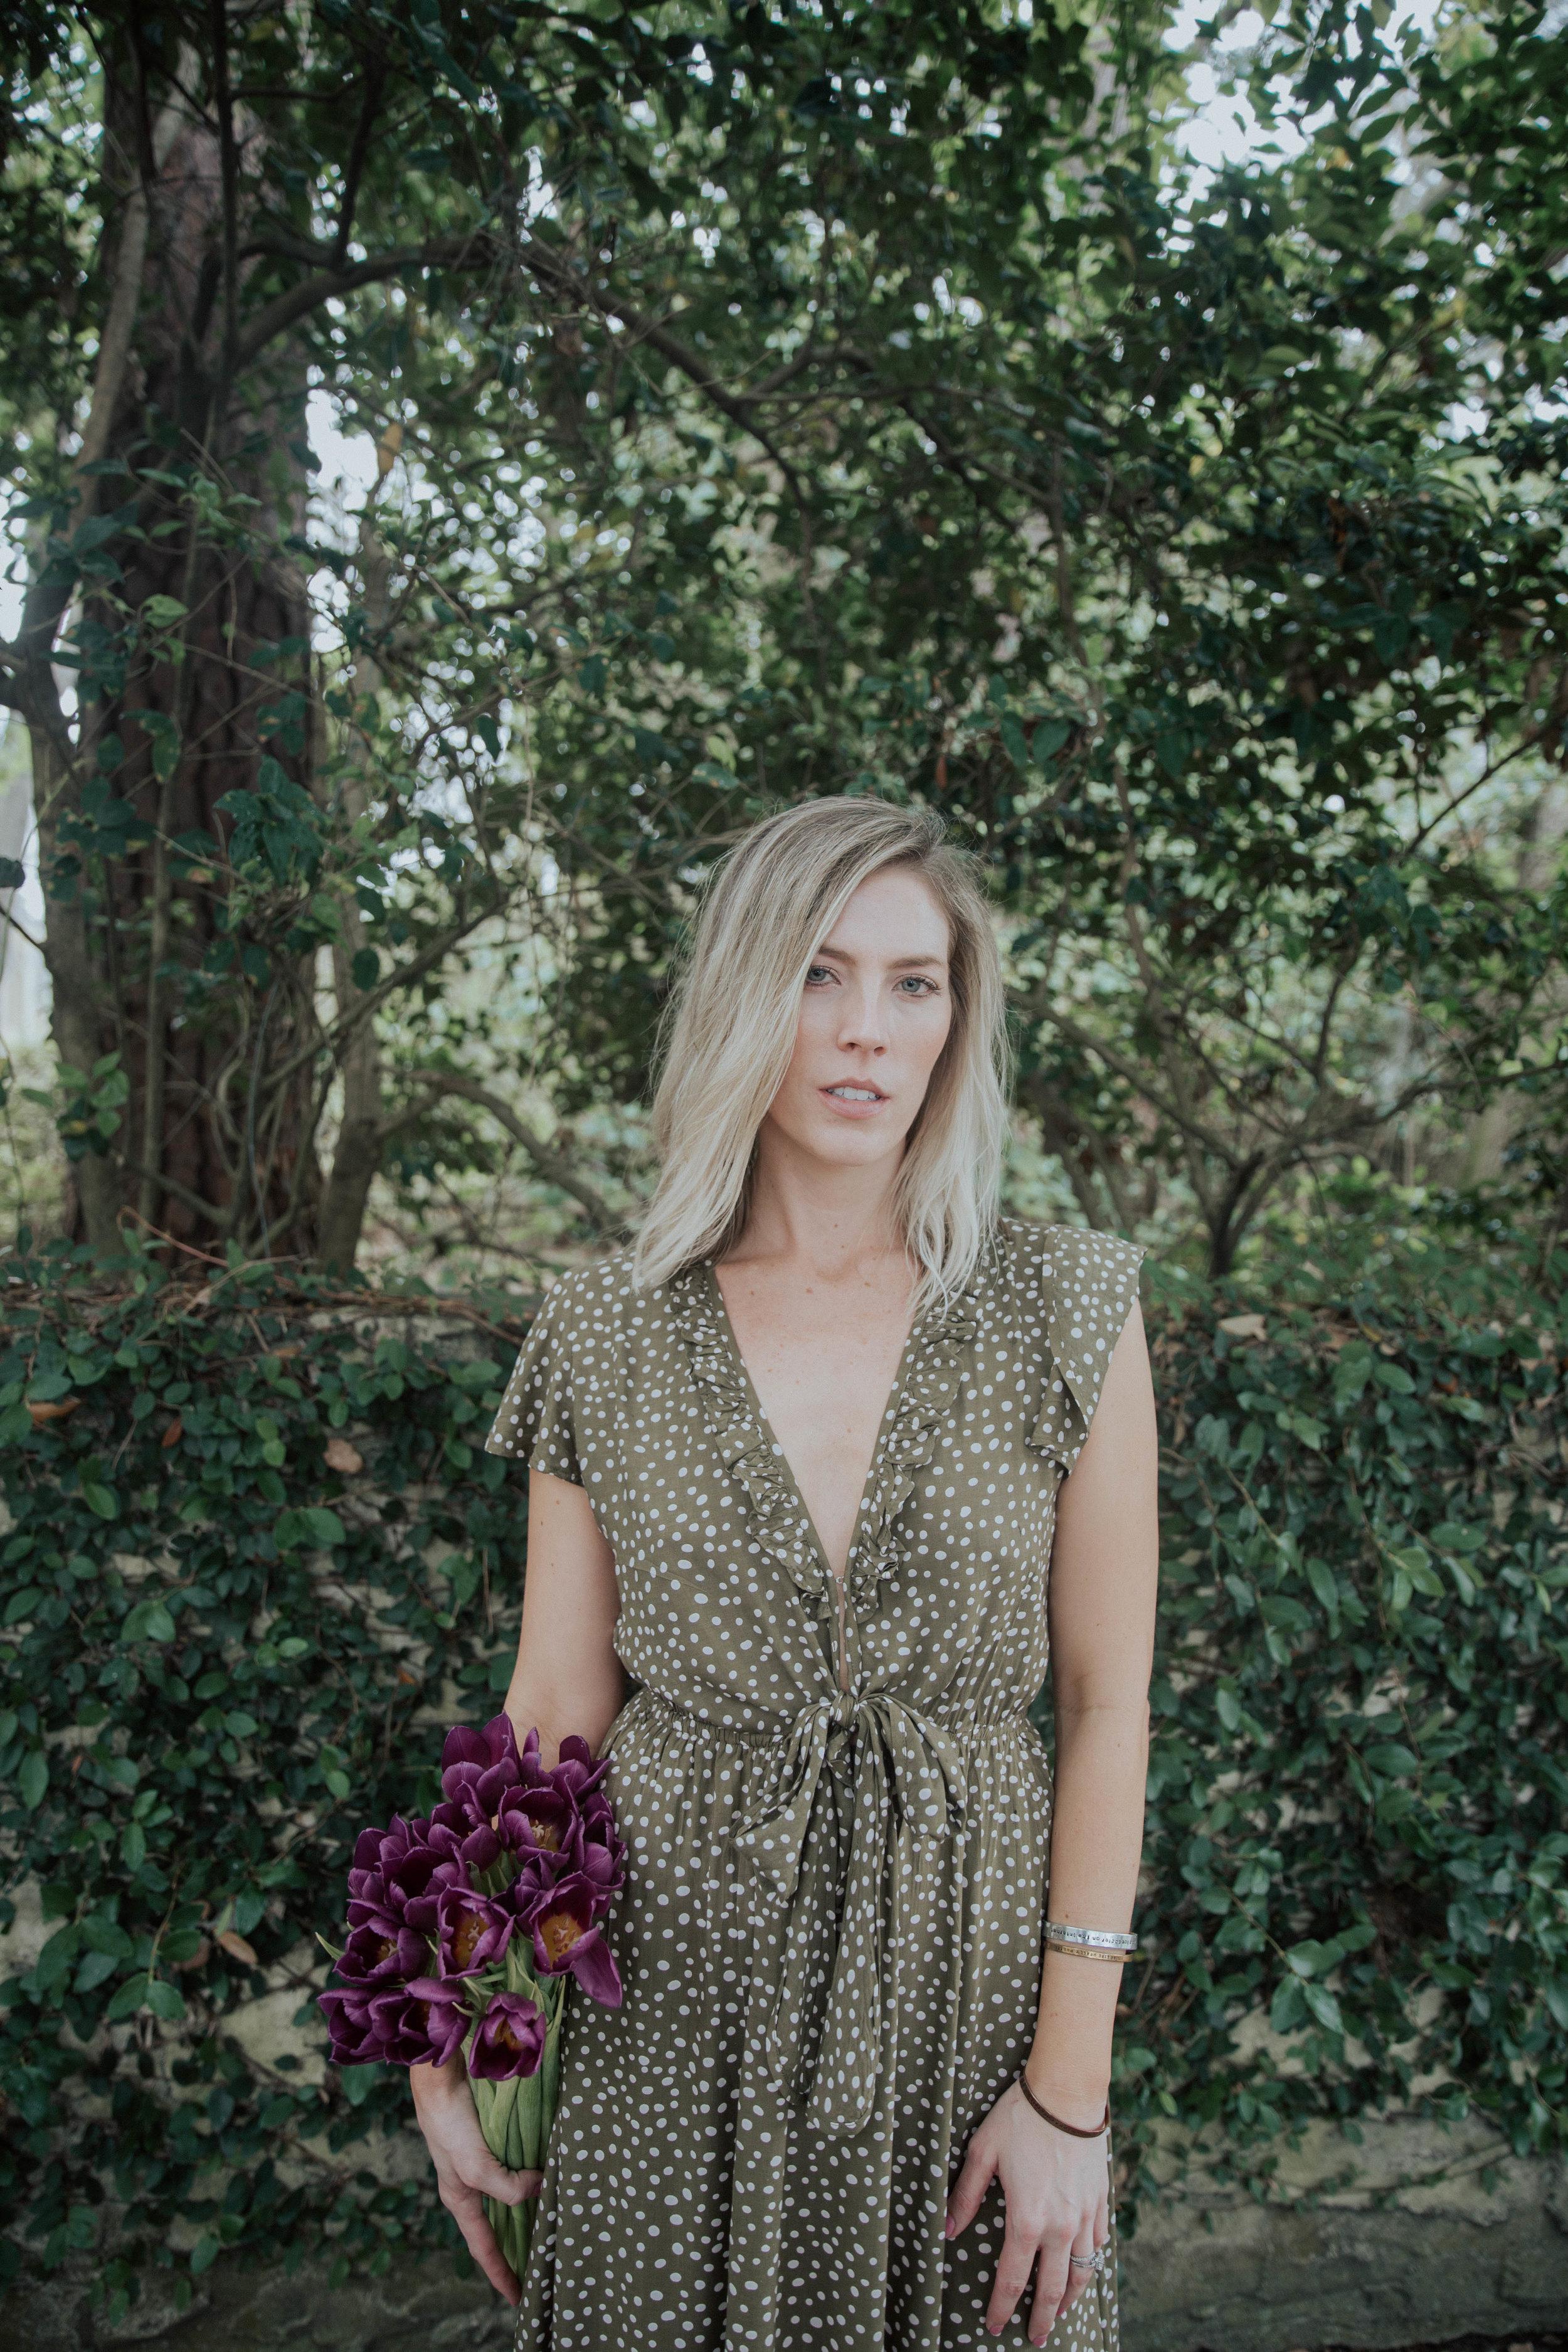 Kivari Dress from Shop Drift in Jacksonville Beach, Florida